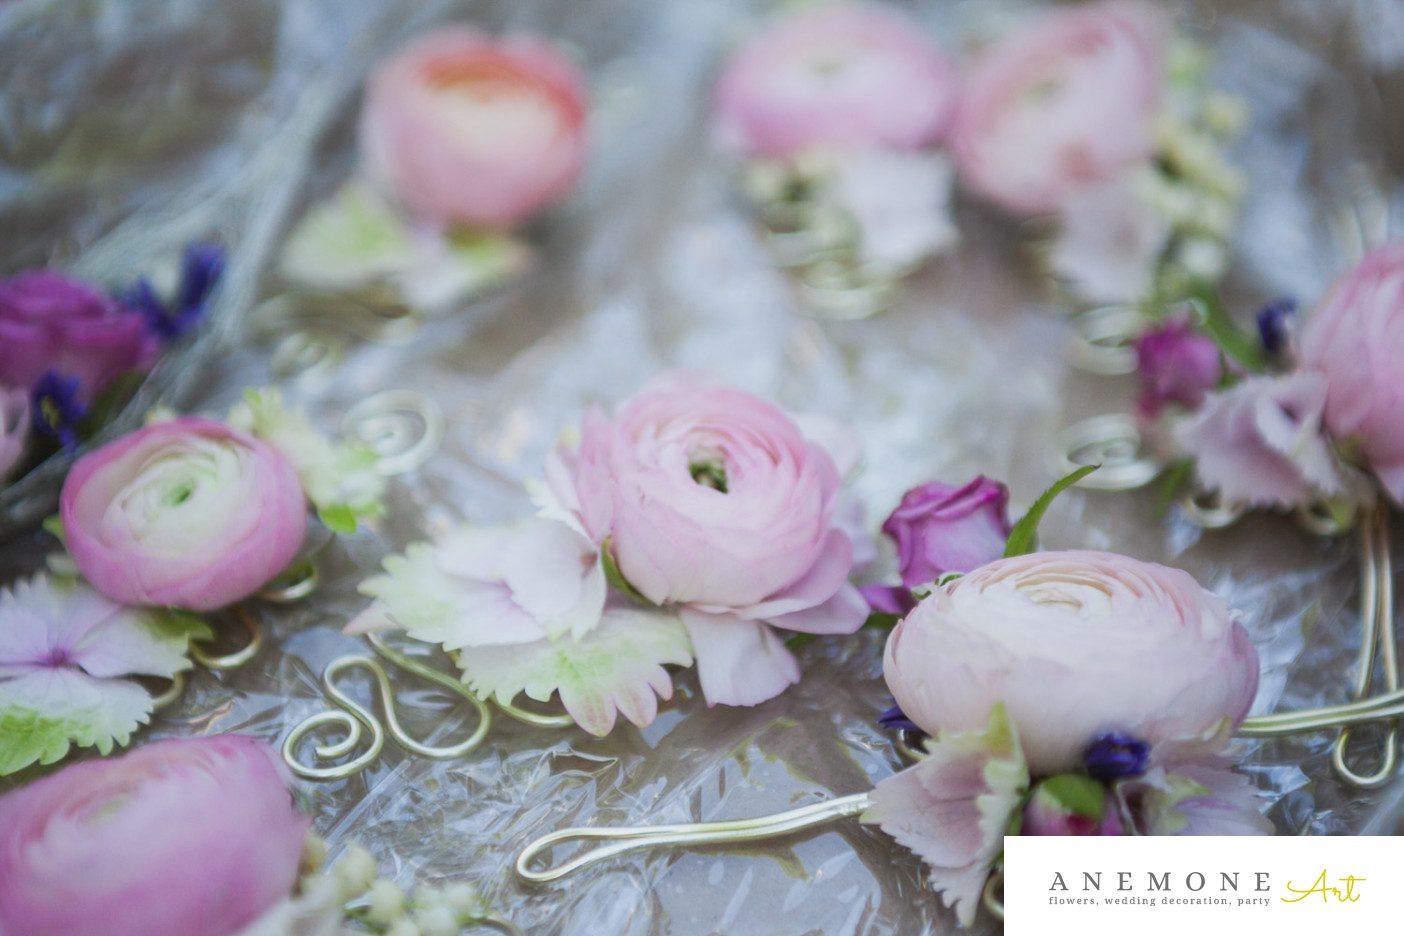 Poza, foto cu Flori de nunta bratara, cocarda, ranunculus, roz in Arad, Timisoara, Oradea (wedding flowers, bouquets) nunta Arad, Timisoara, Oradea